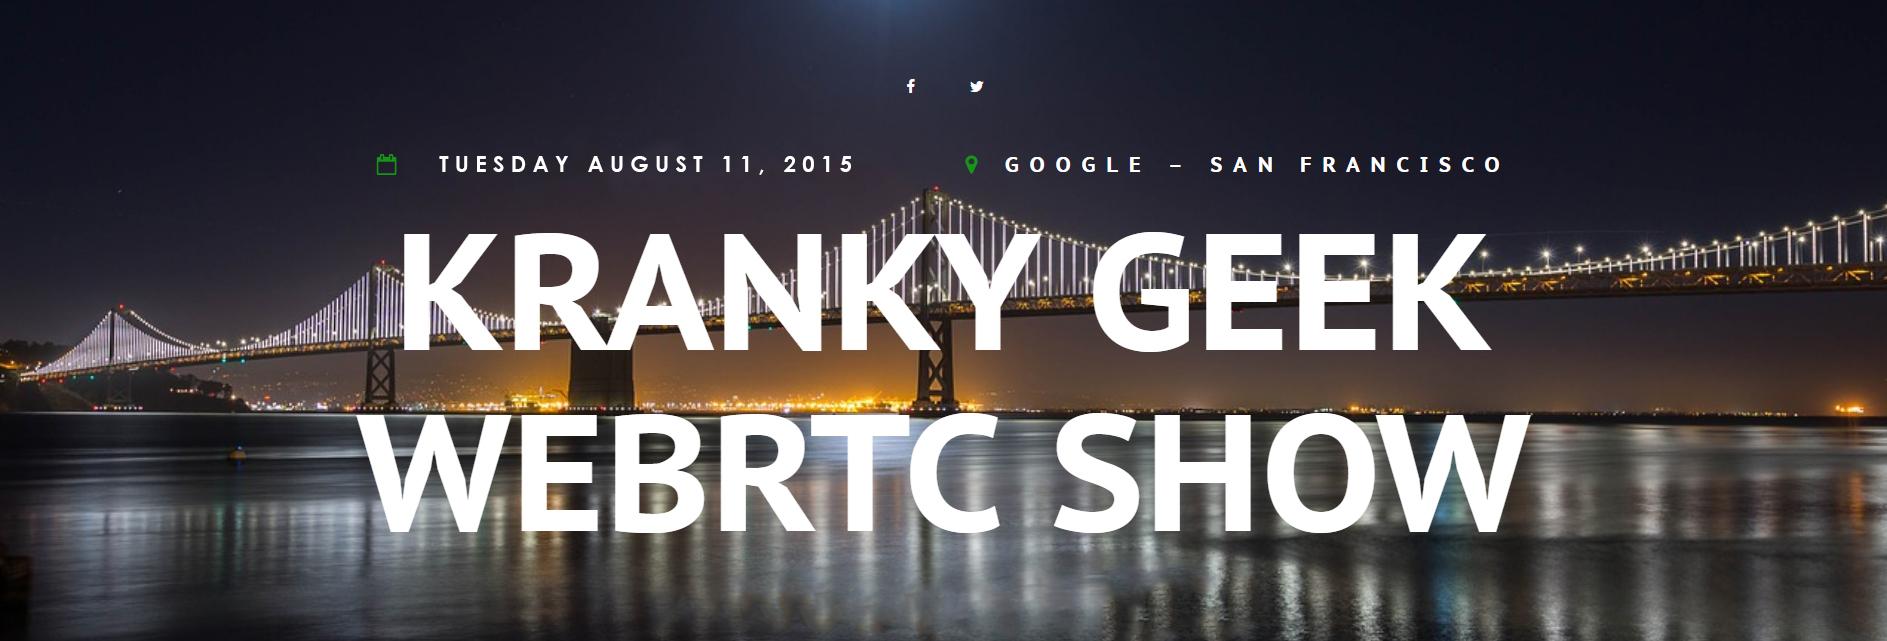 Kranky Geek WebRTC 2015 - San Francisco